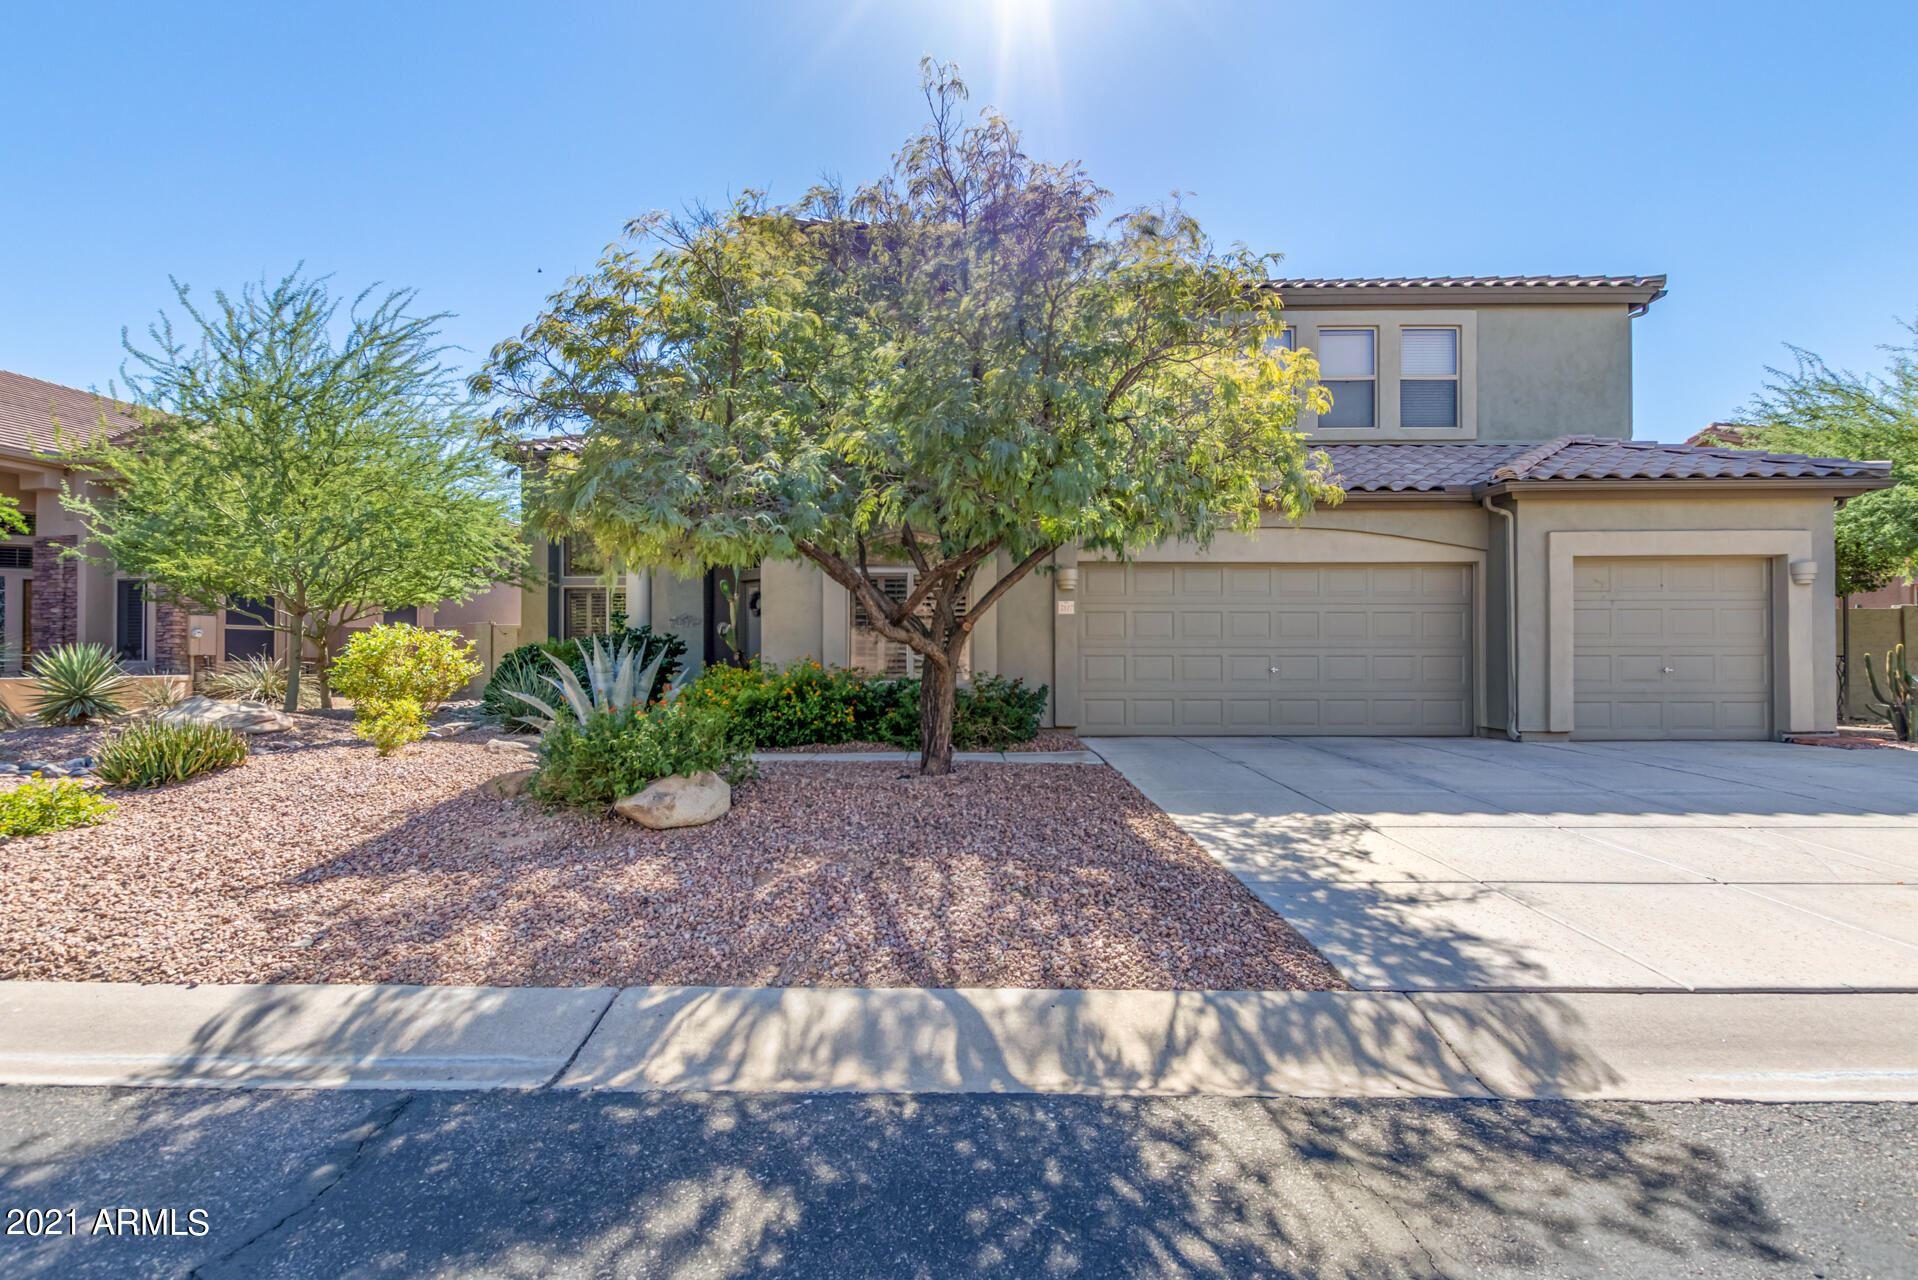 Photo of 7347 E SAYAN Street, Mesa, AZ 85207 (MLS # 6307908)